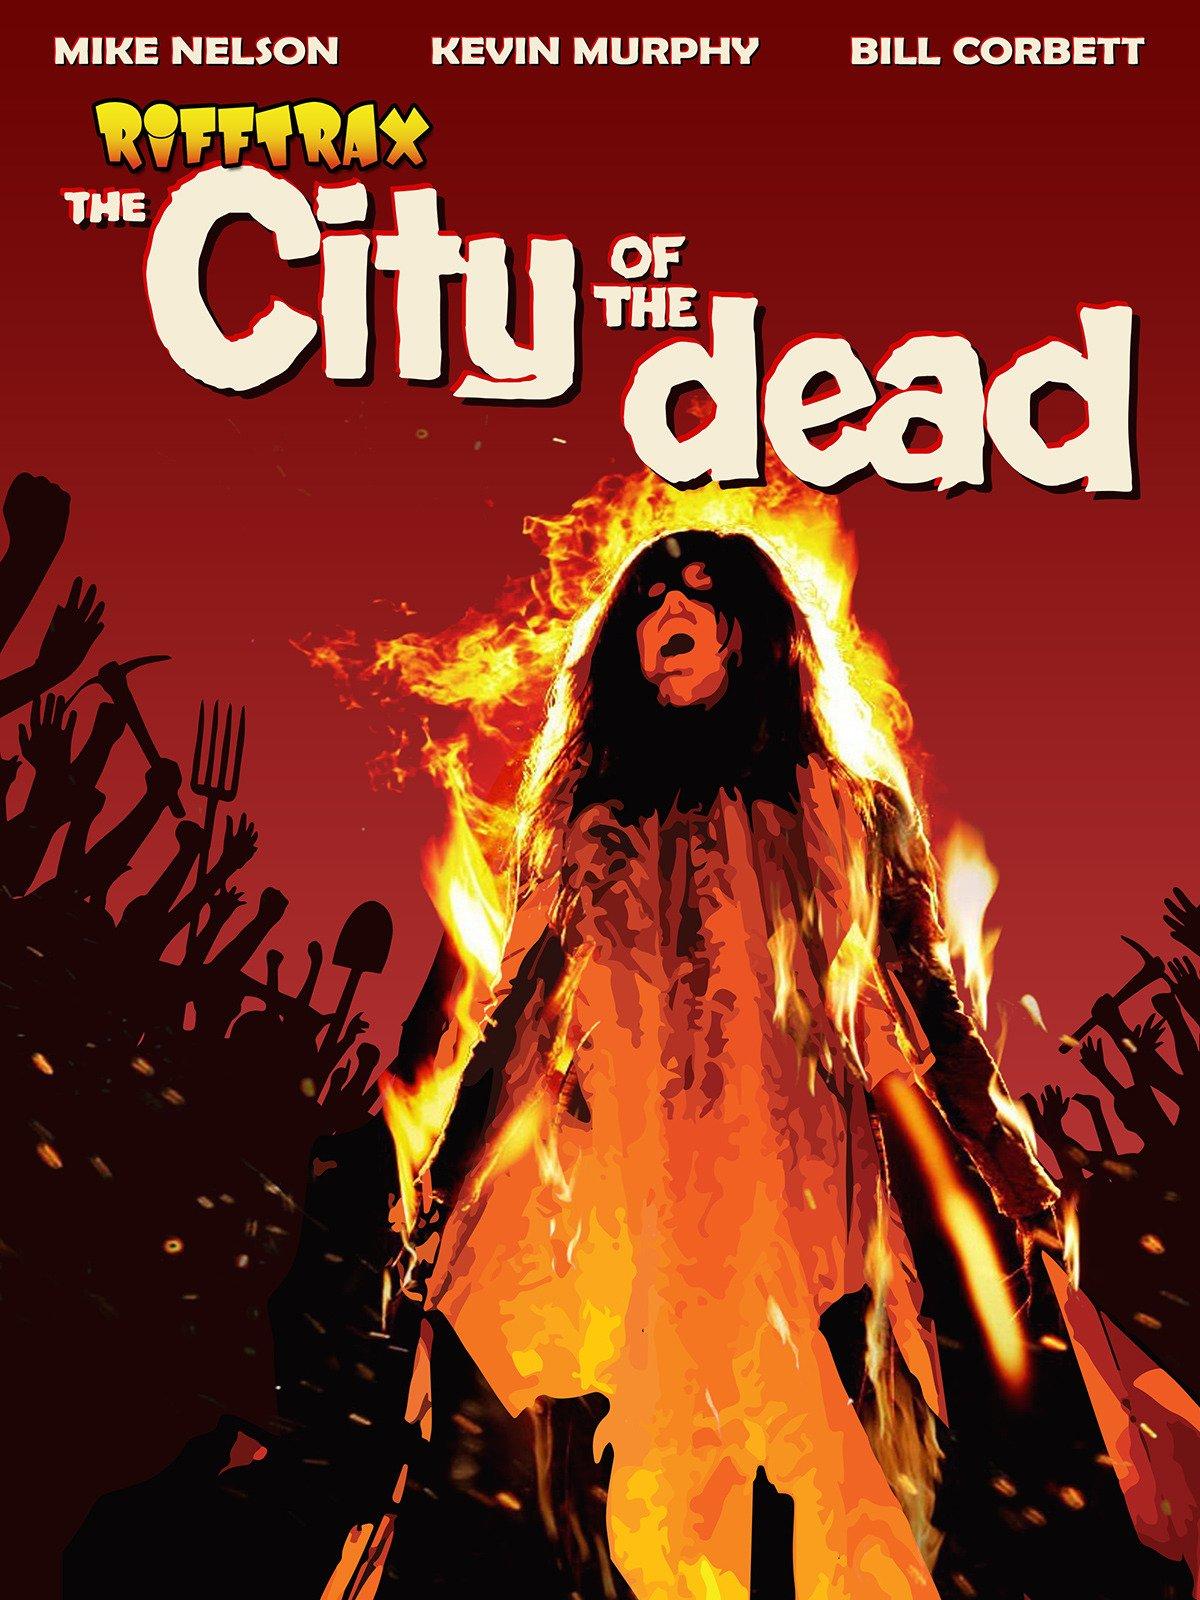 RiffTrax: City of the Dead on Amazon Prime Video UK